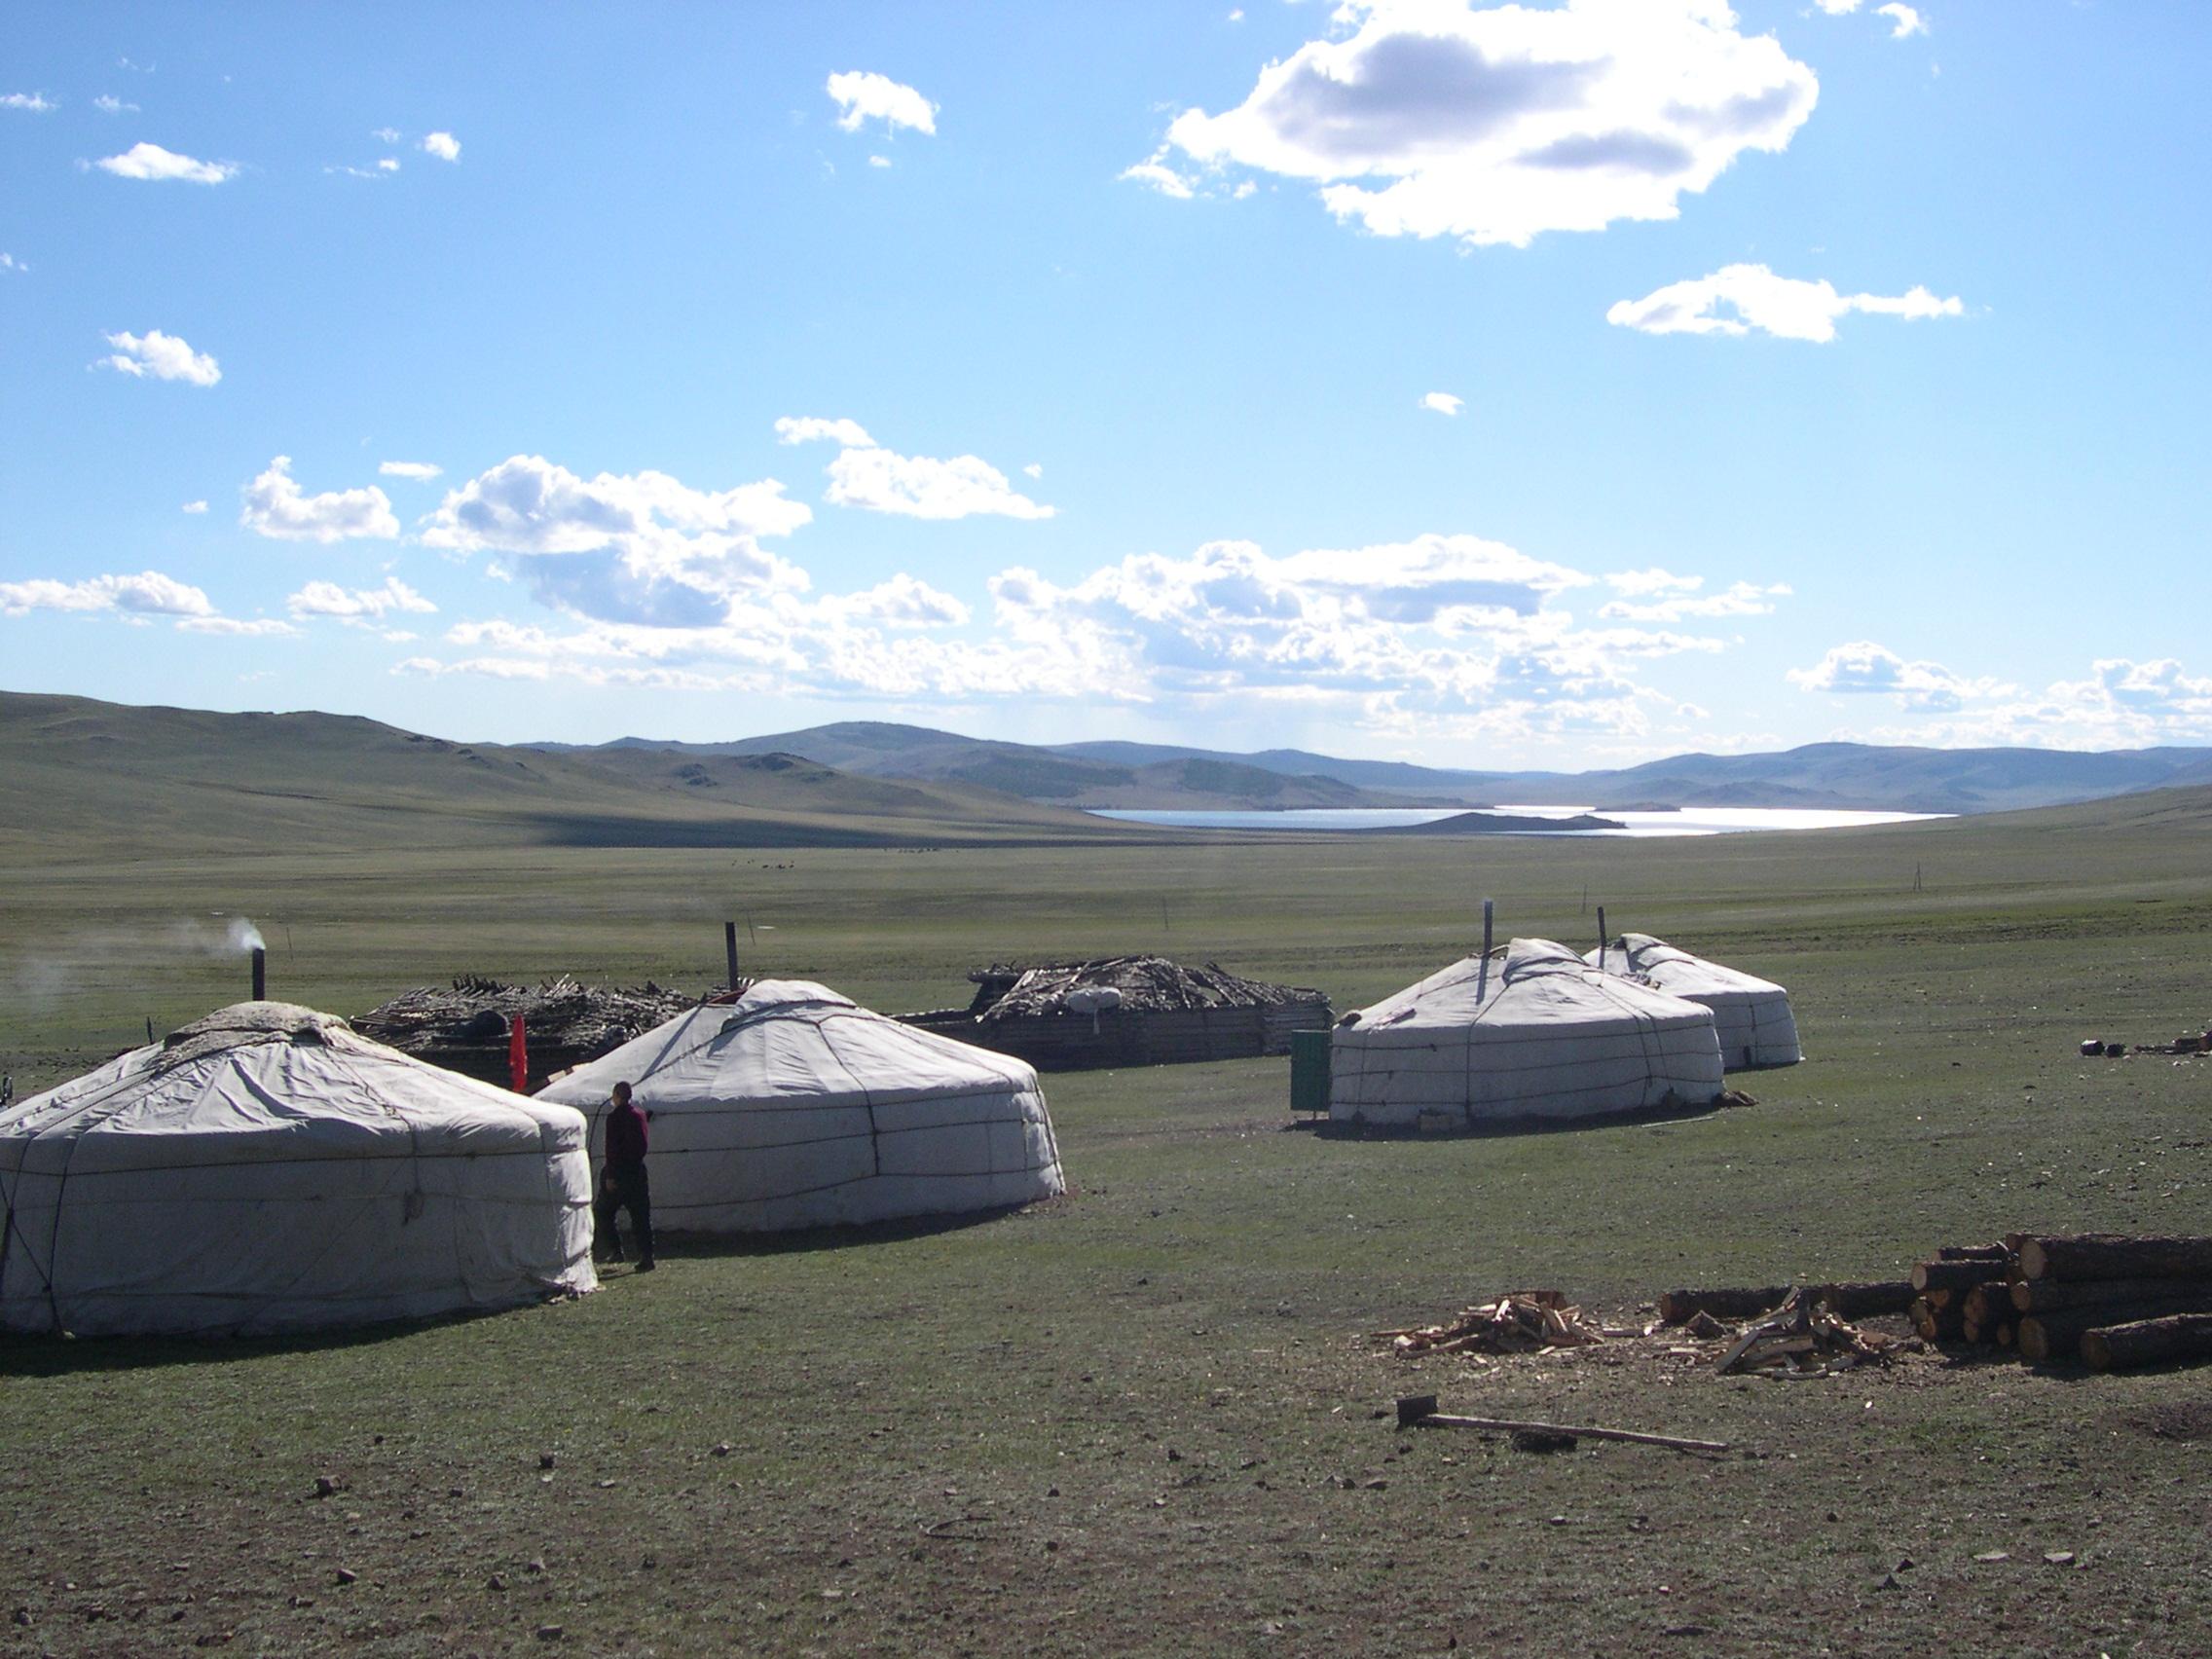 Mongolia's Nadaam Festival 2